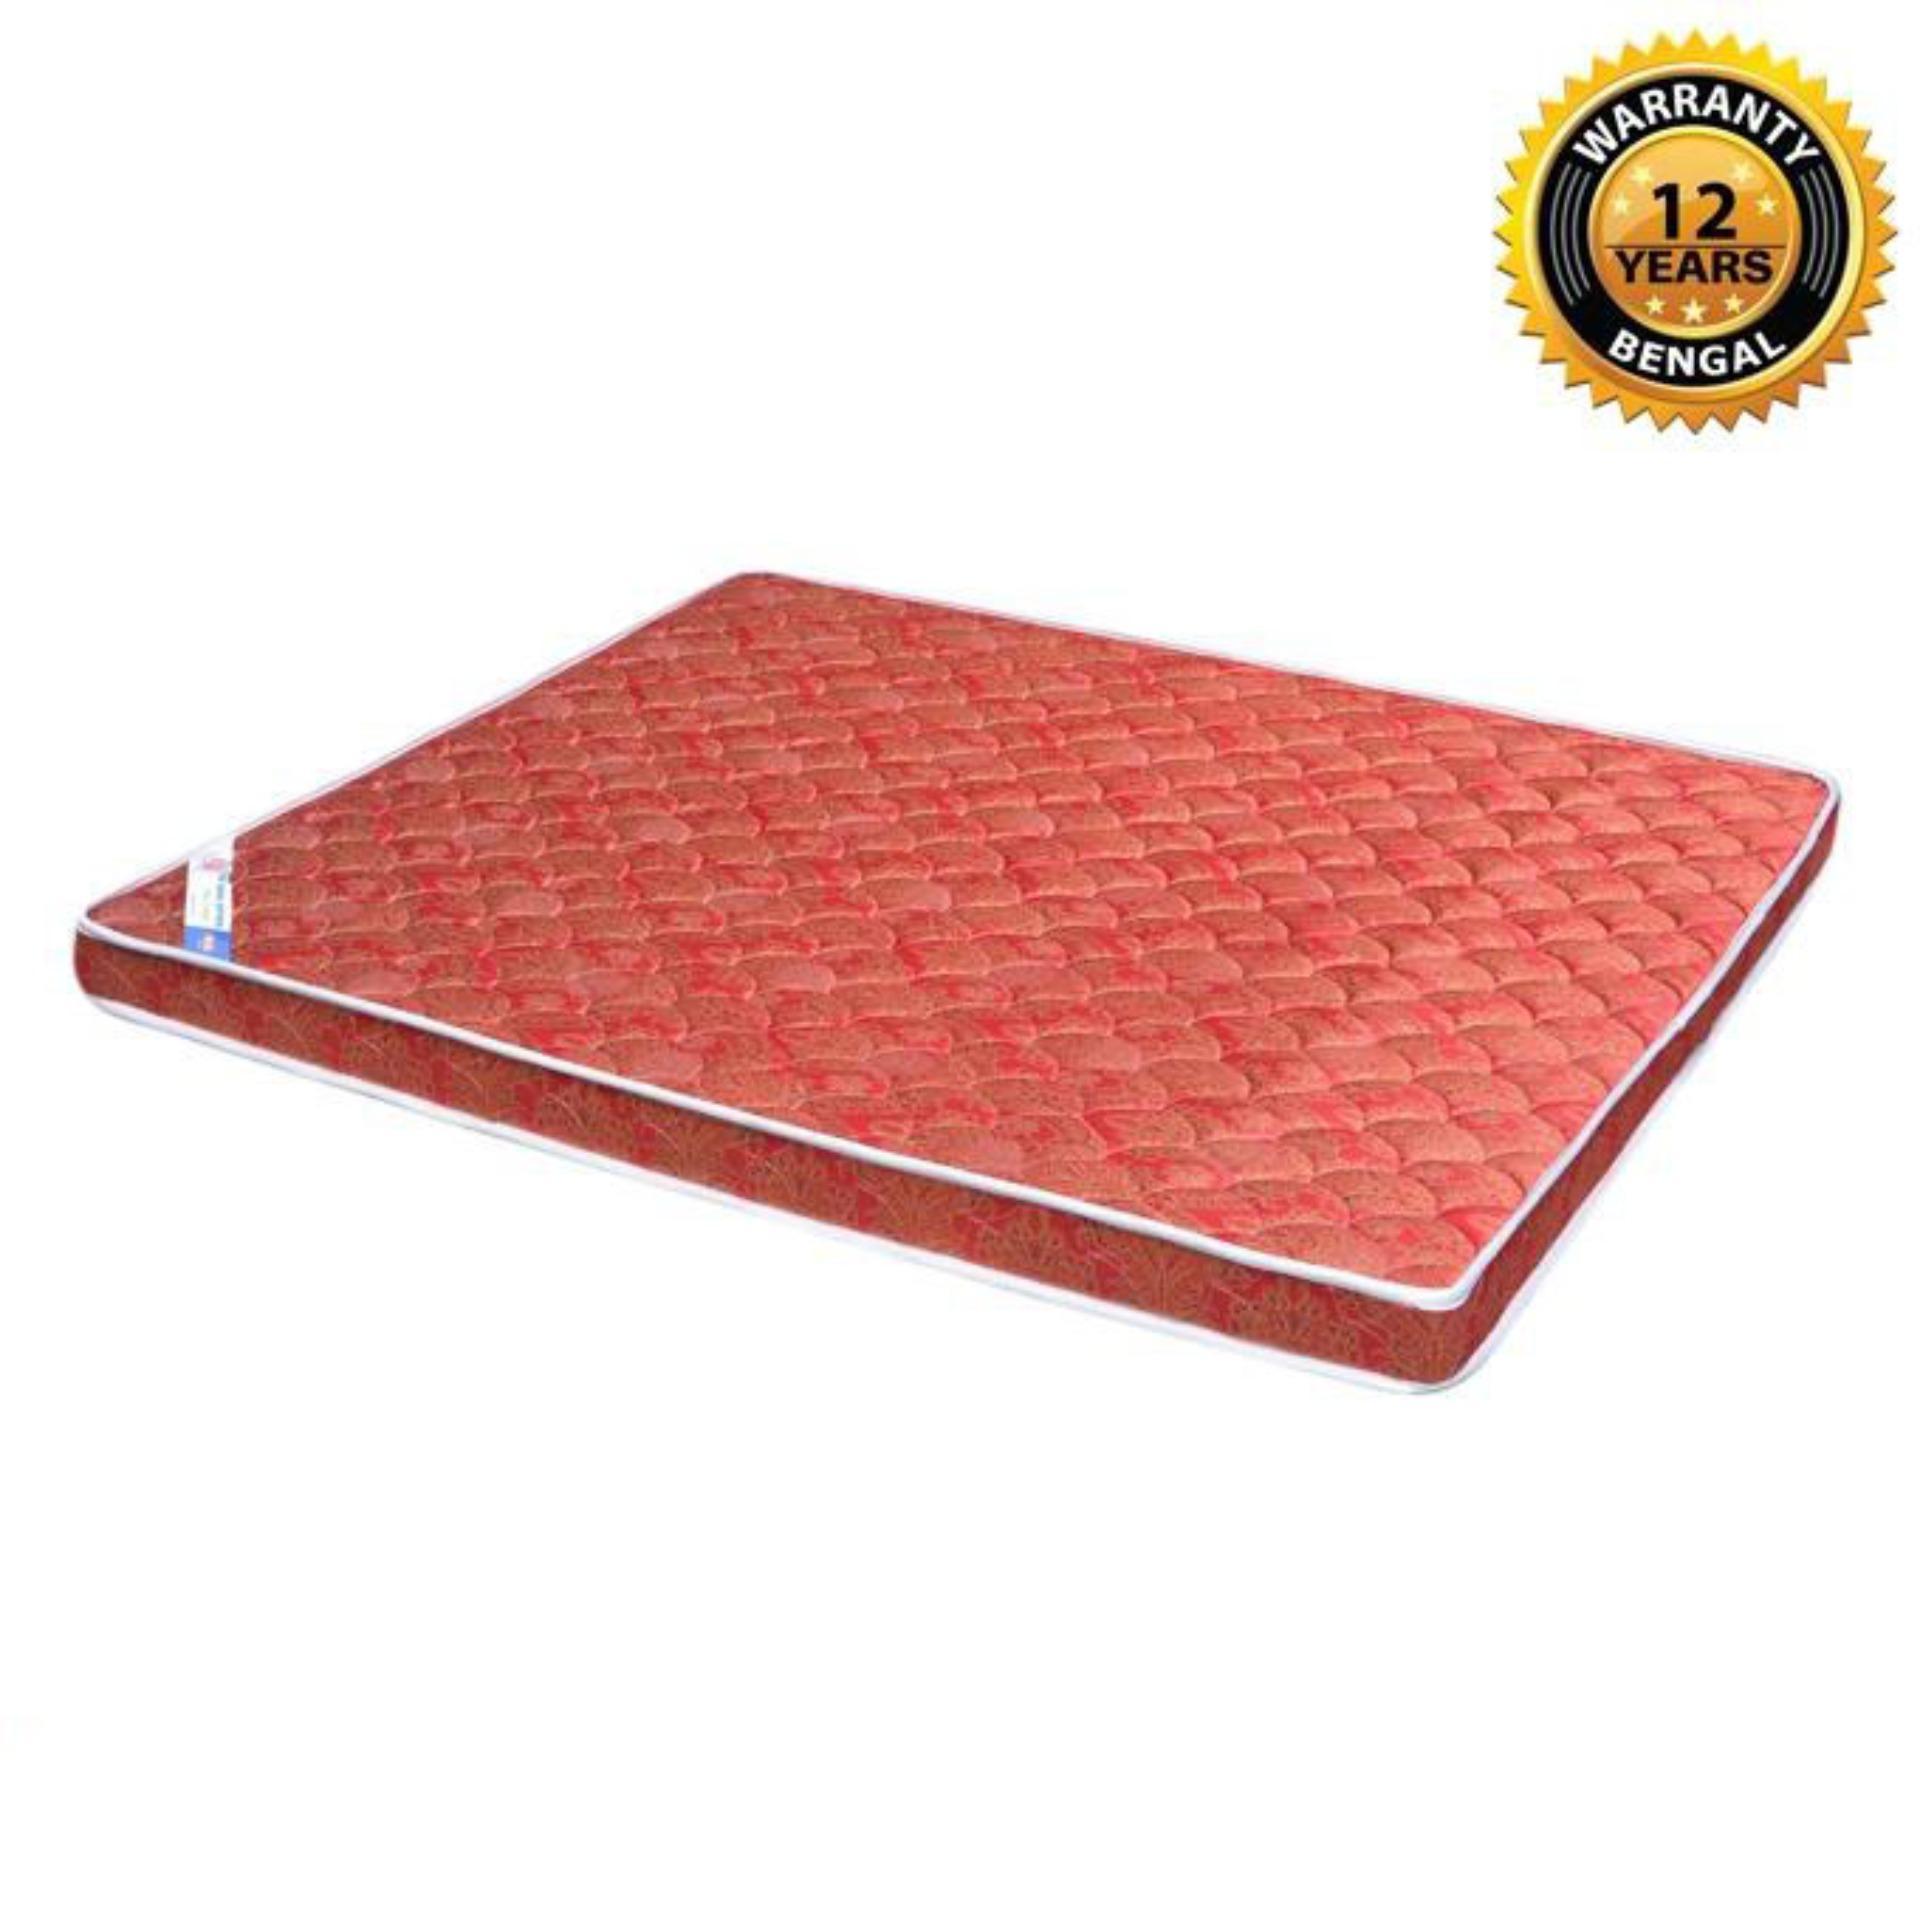 "Bengal Spring Mattress (84""x60""x10"") - Red"